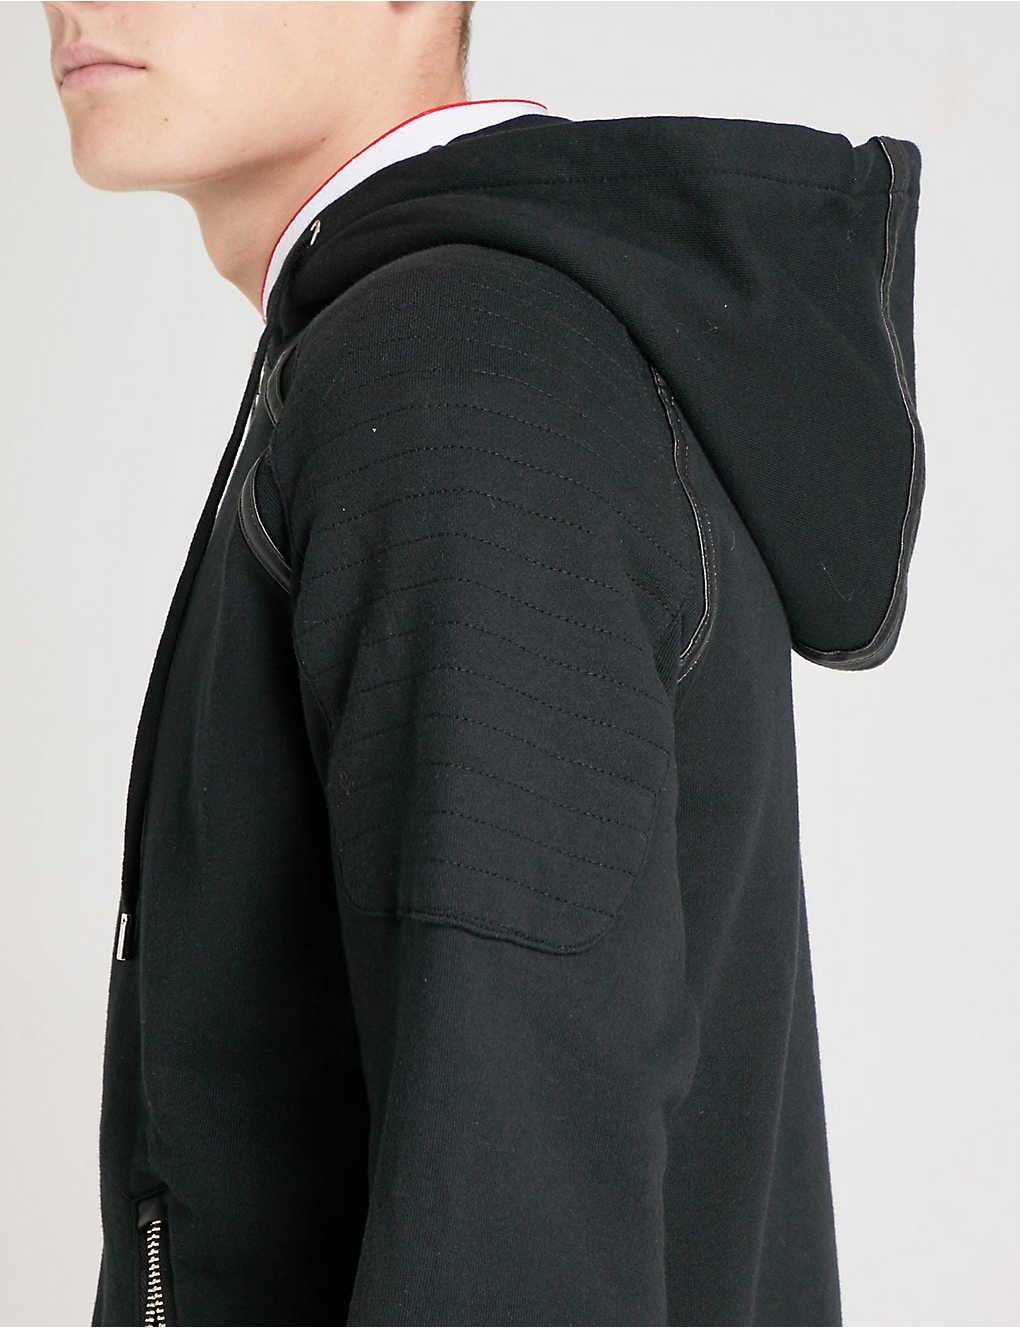 dbe53c85929 THE KOOPLES - Faux leather-trim cotton-jersey hoody | Selfridges.com